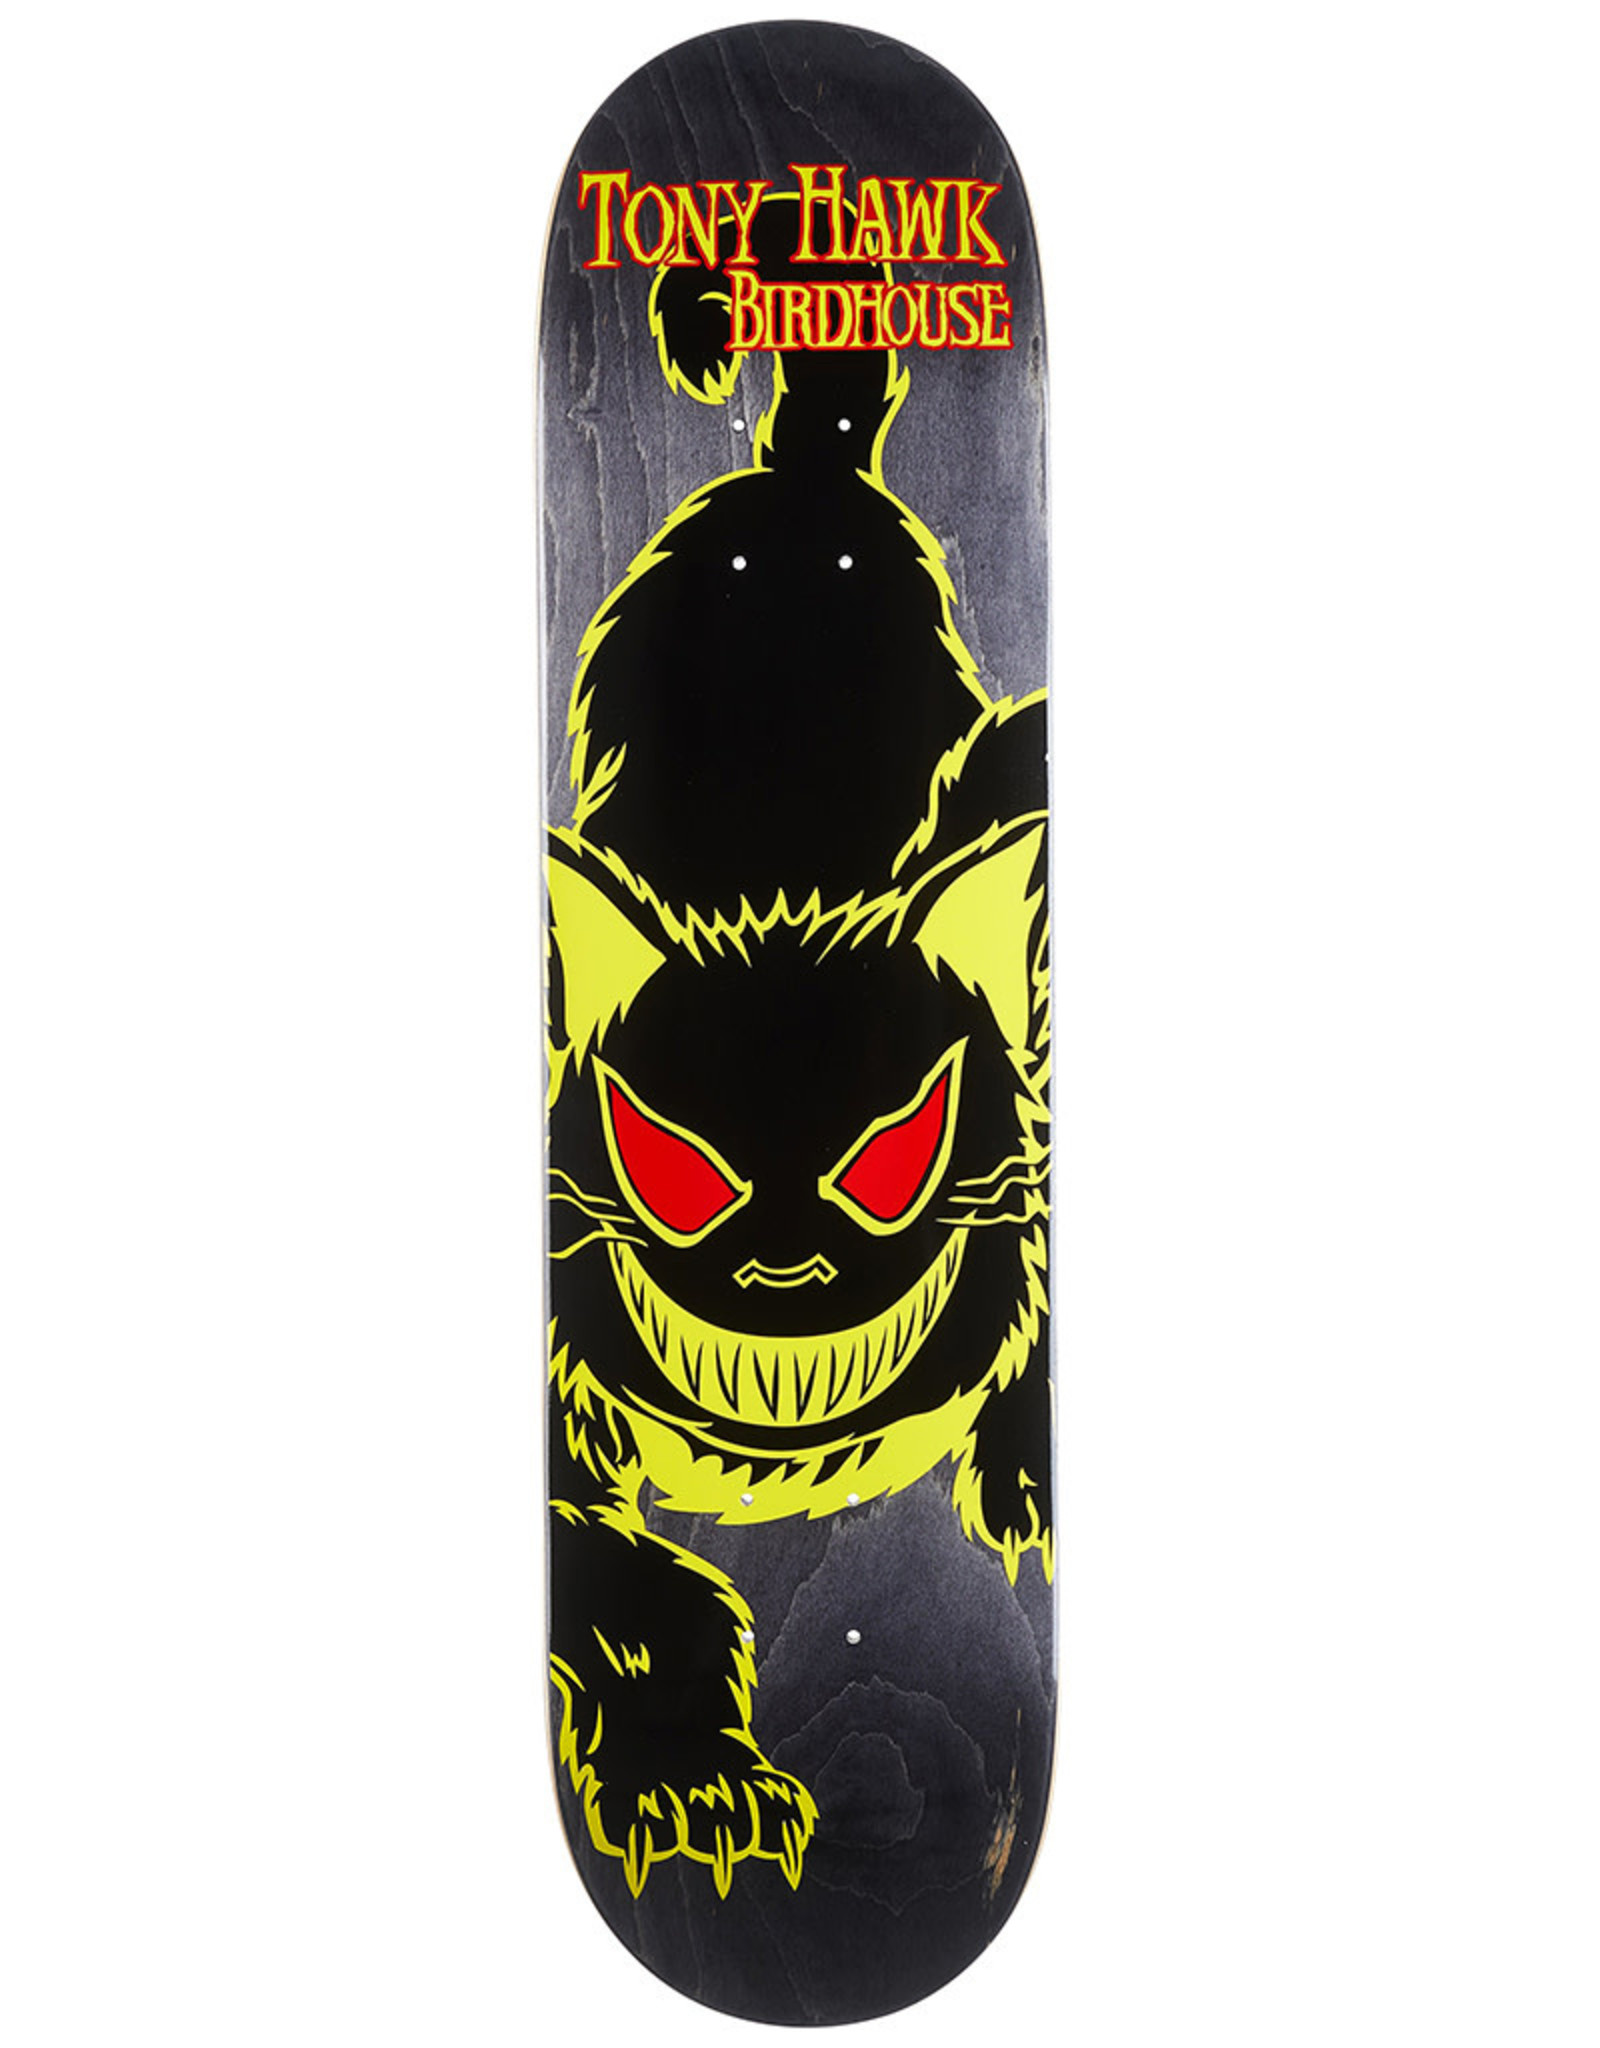 Birdhouse Birdhouse Deck Tony Hawk Evil Cat Yellow (8.0)